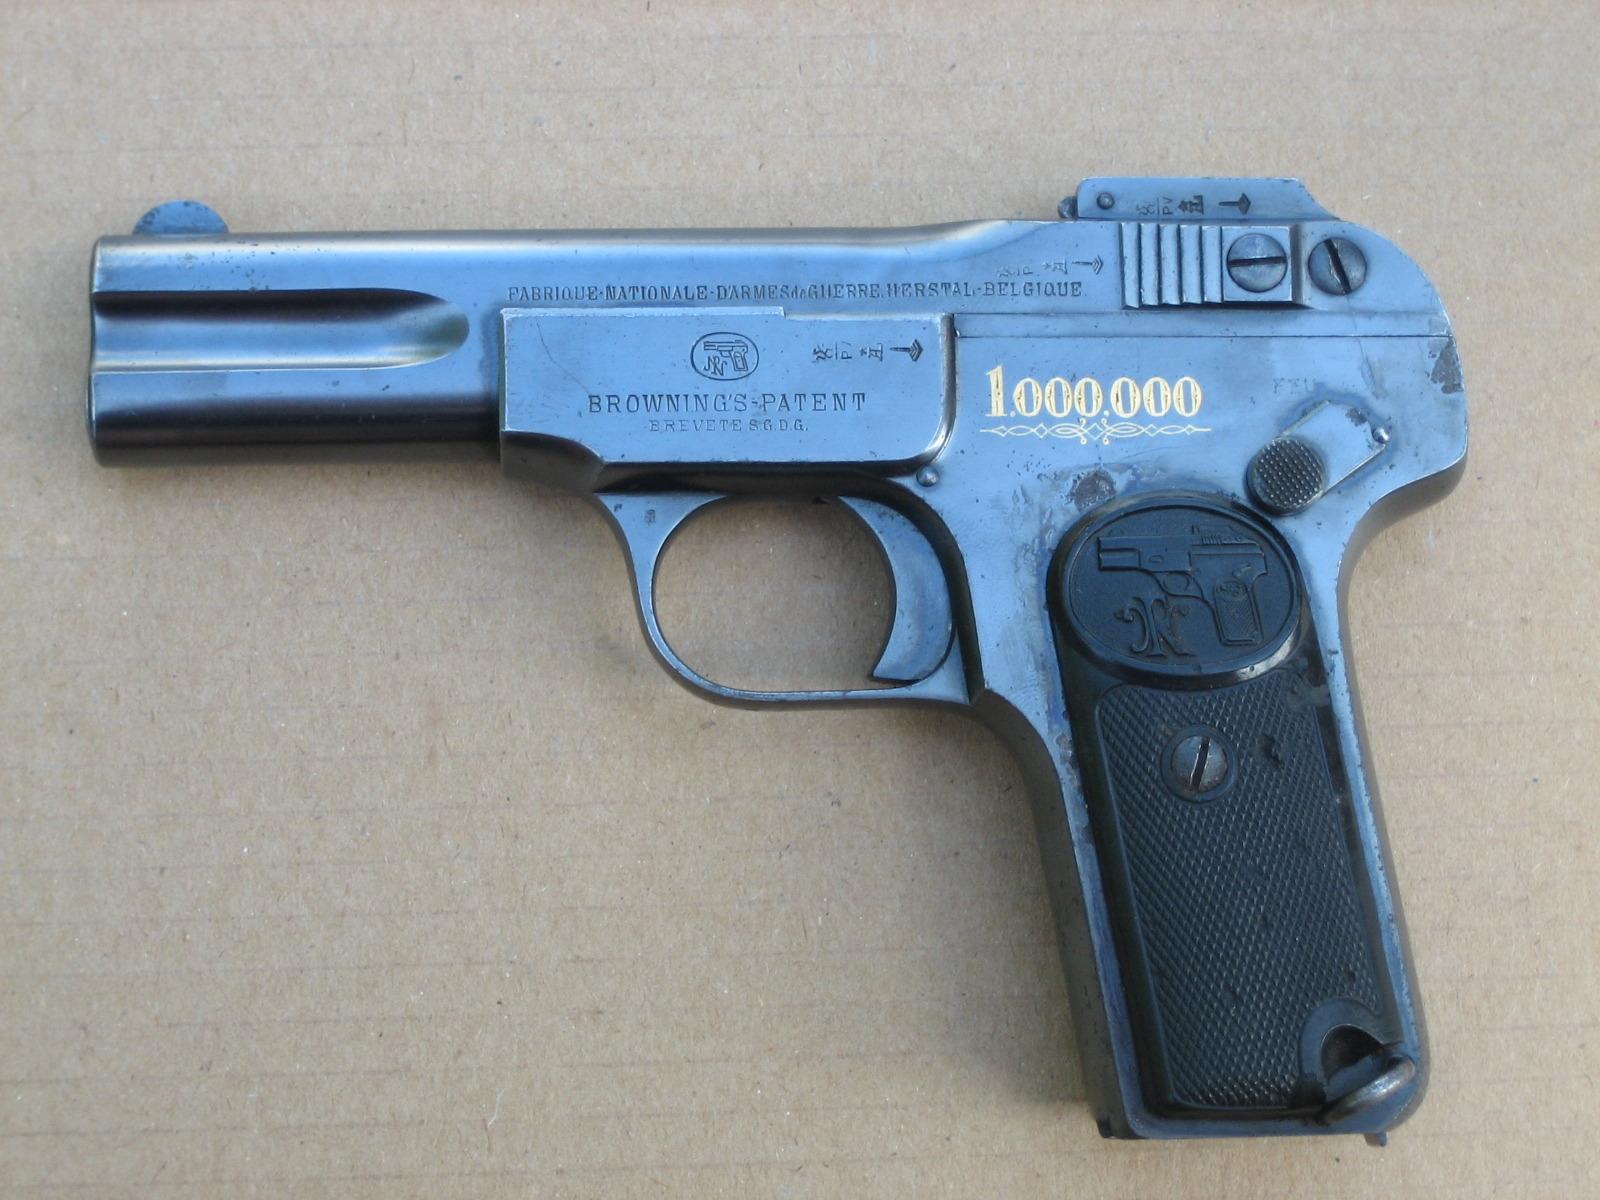 je cherche information  FN1900 No serial 1.000.000 IMG_0112